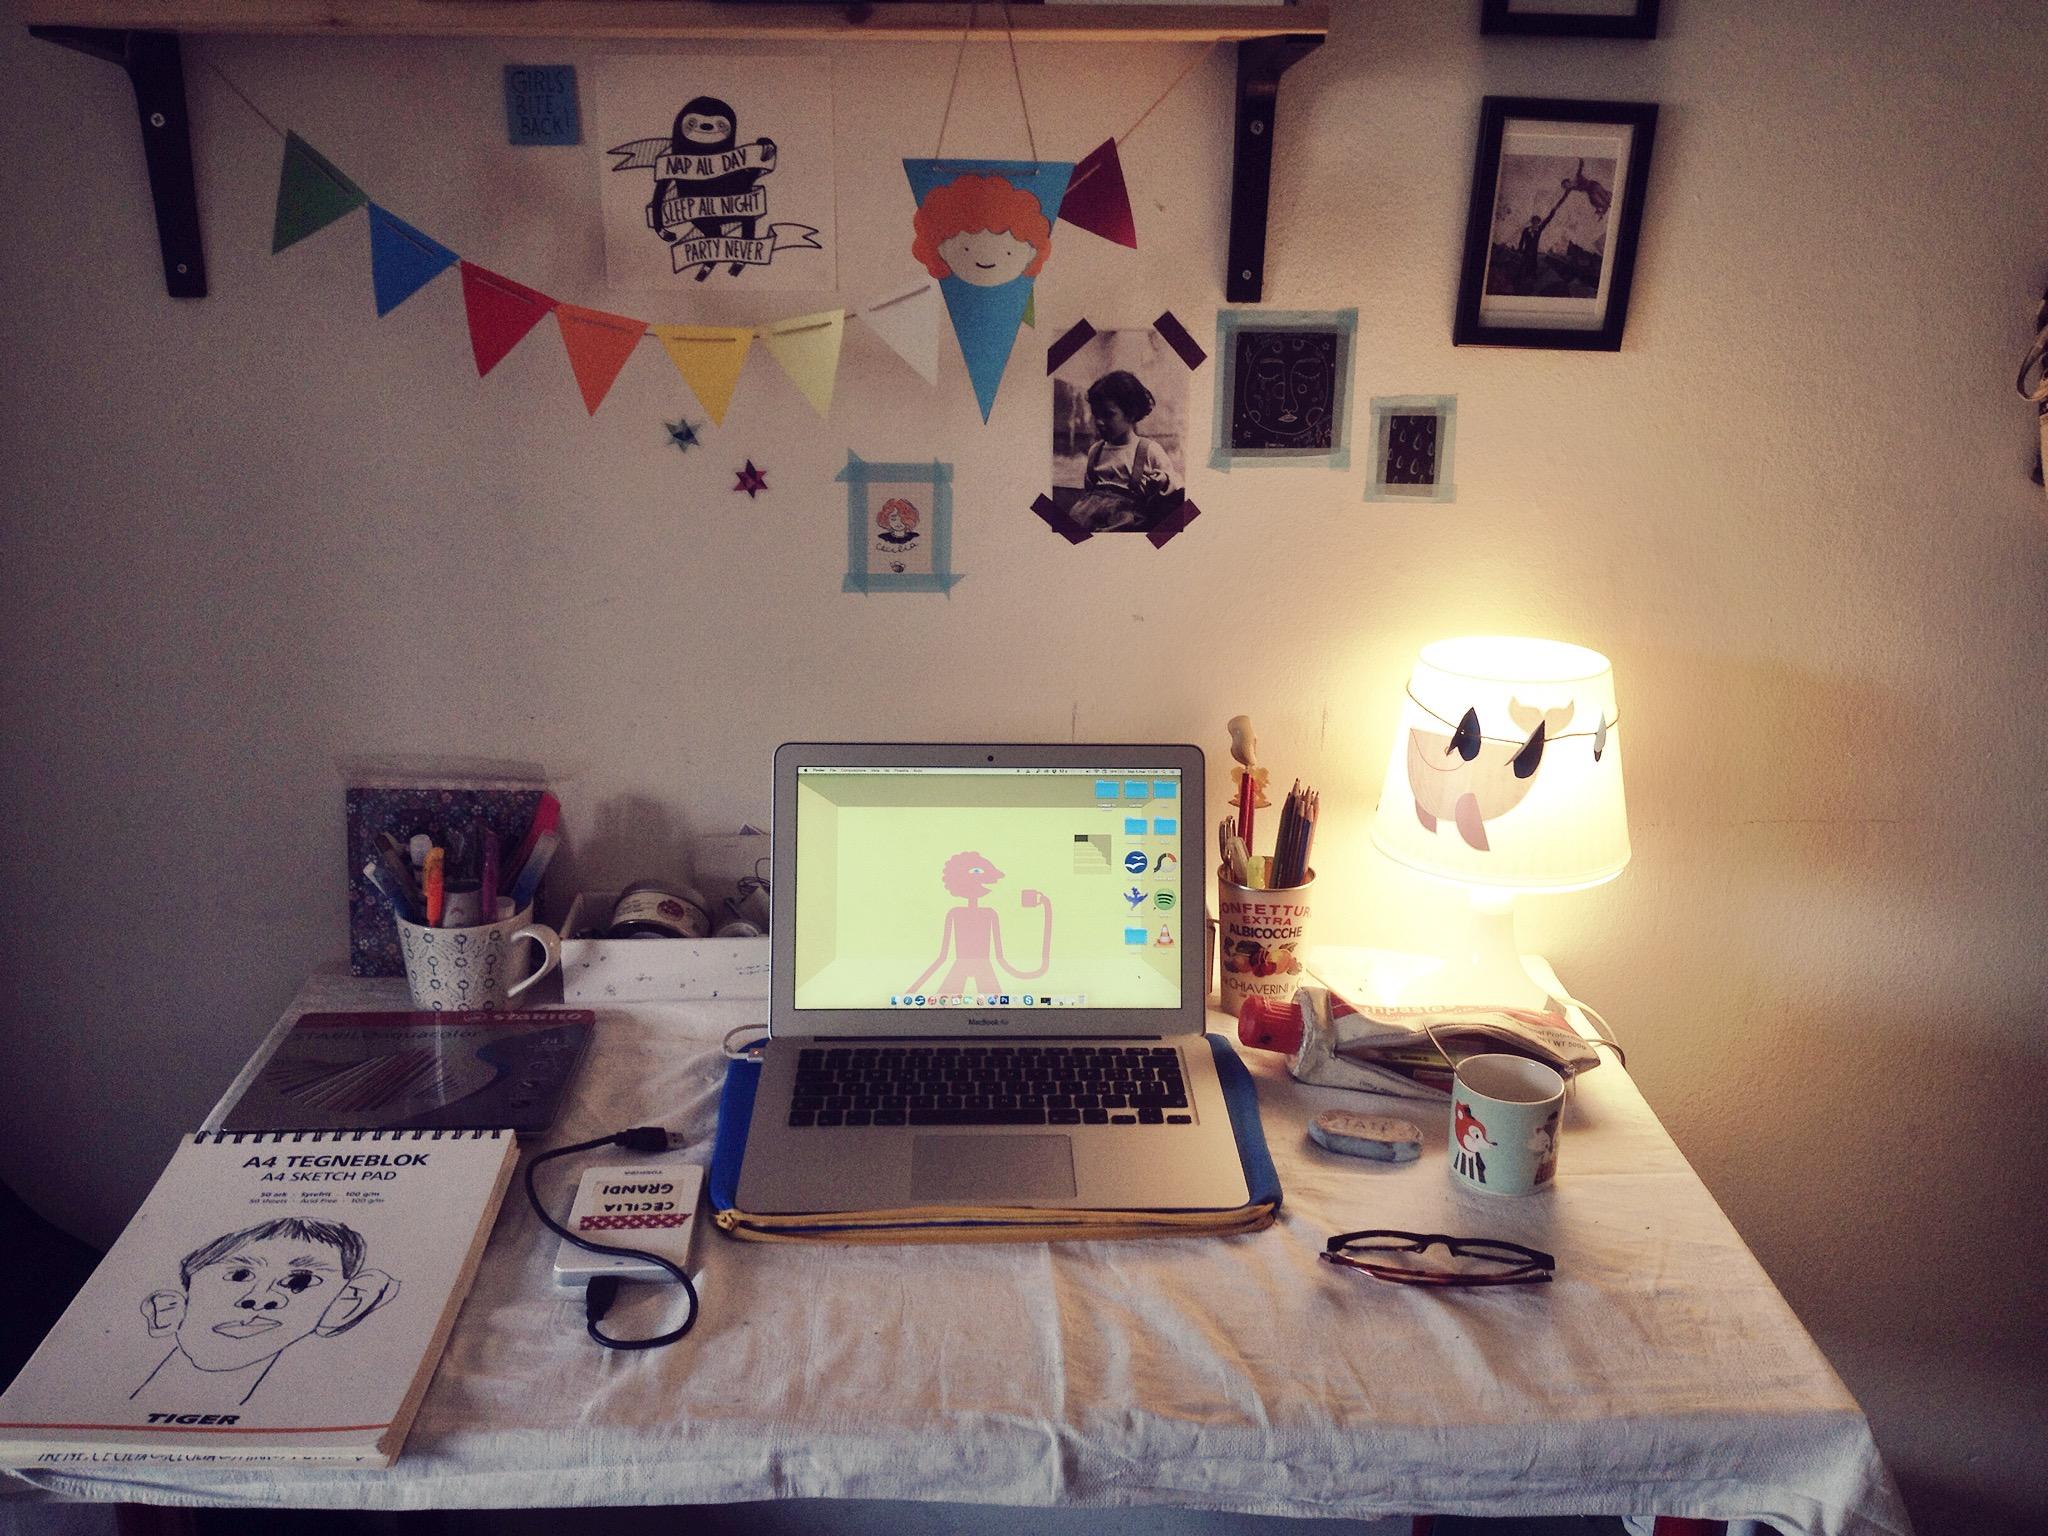 scrivania mistobosco